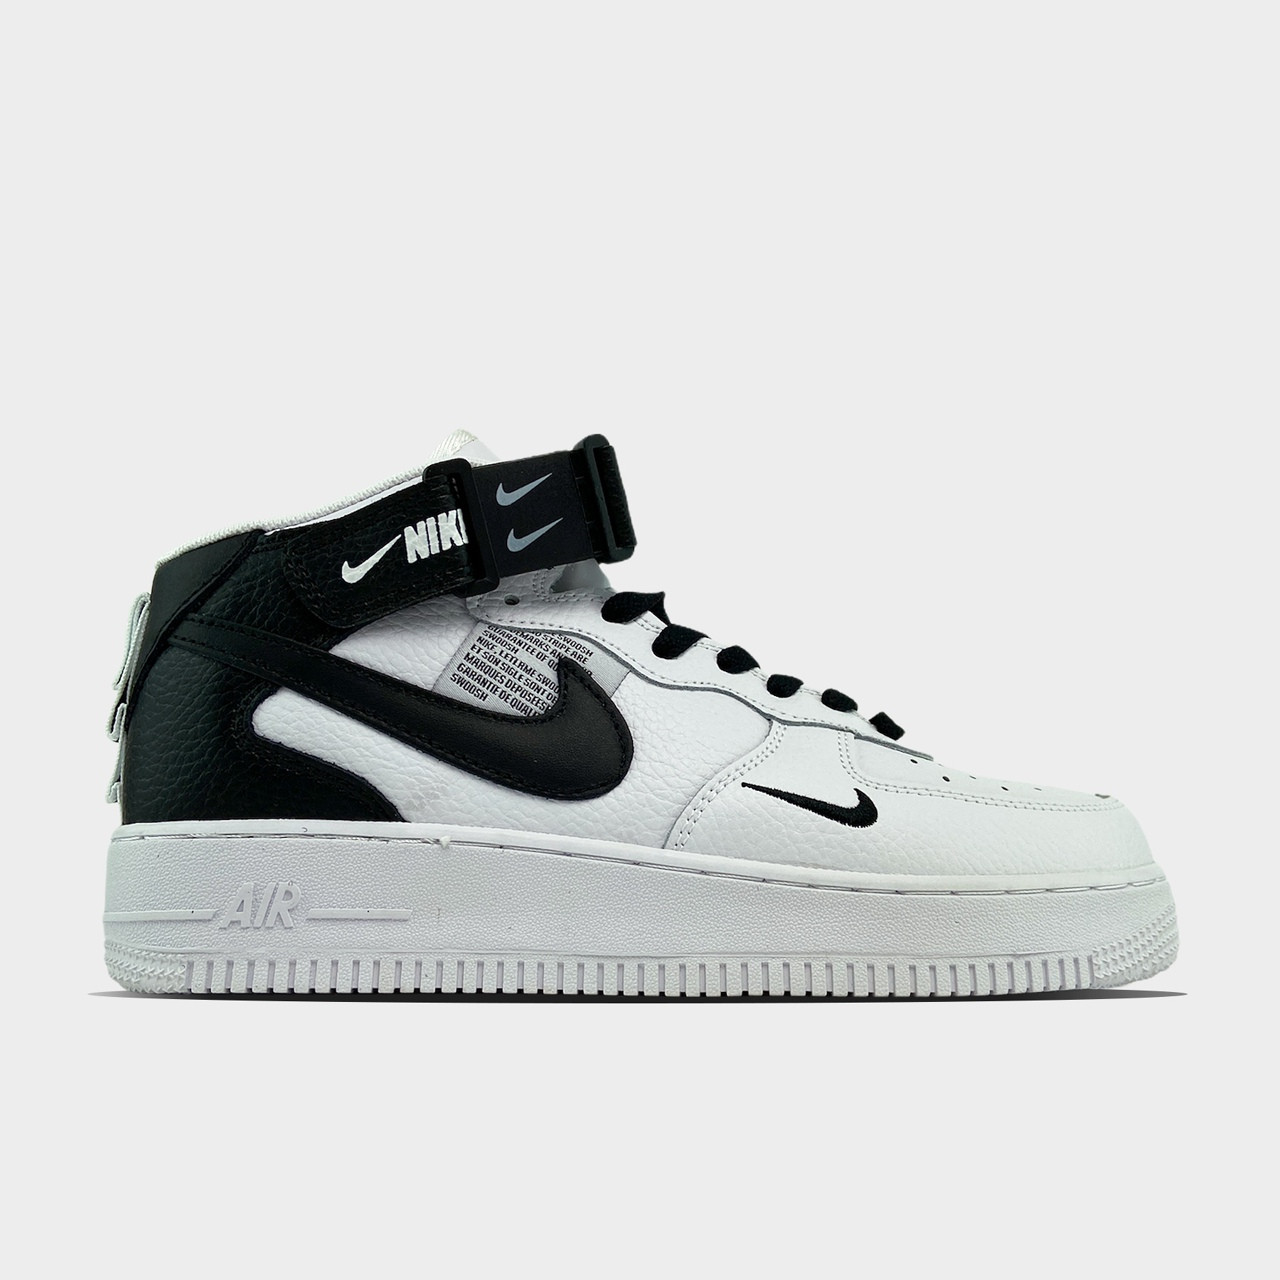 Мужские/ женские кроссовки Nike Air Force 1 High Utility White Black